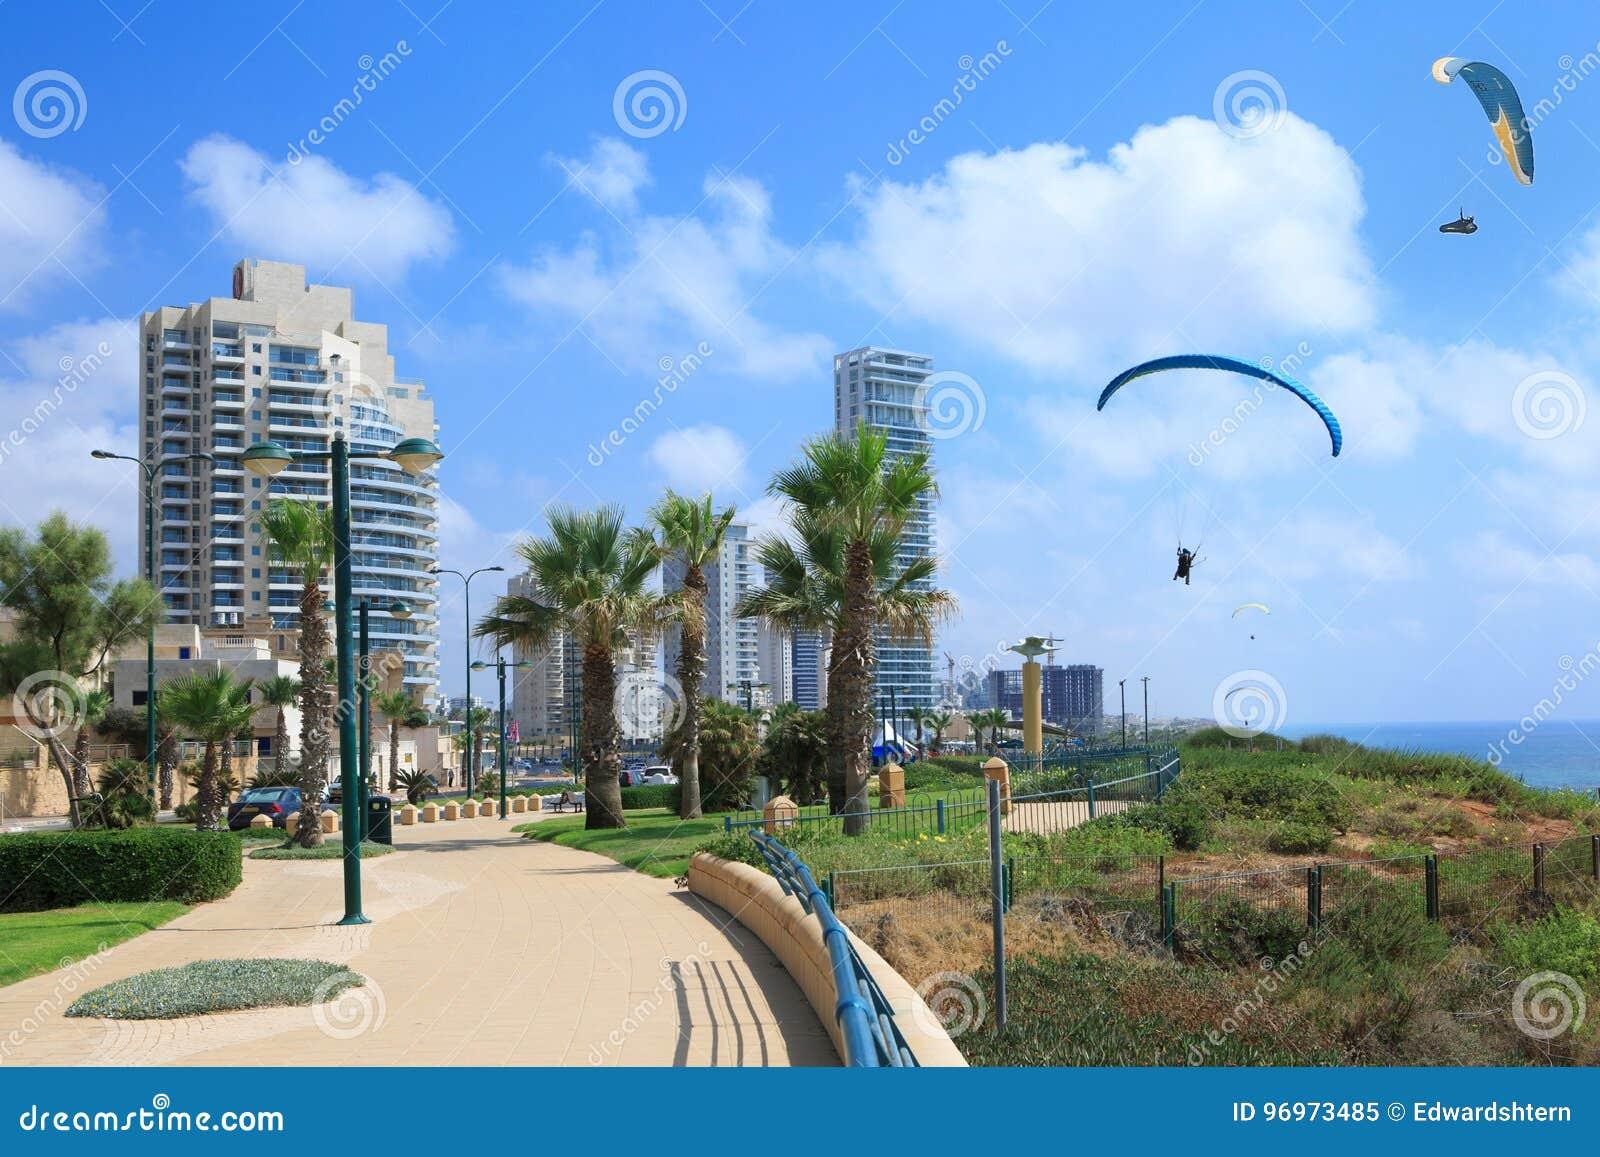 Netania海滩 看见在天空的滑翔伞